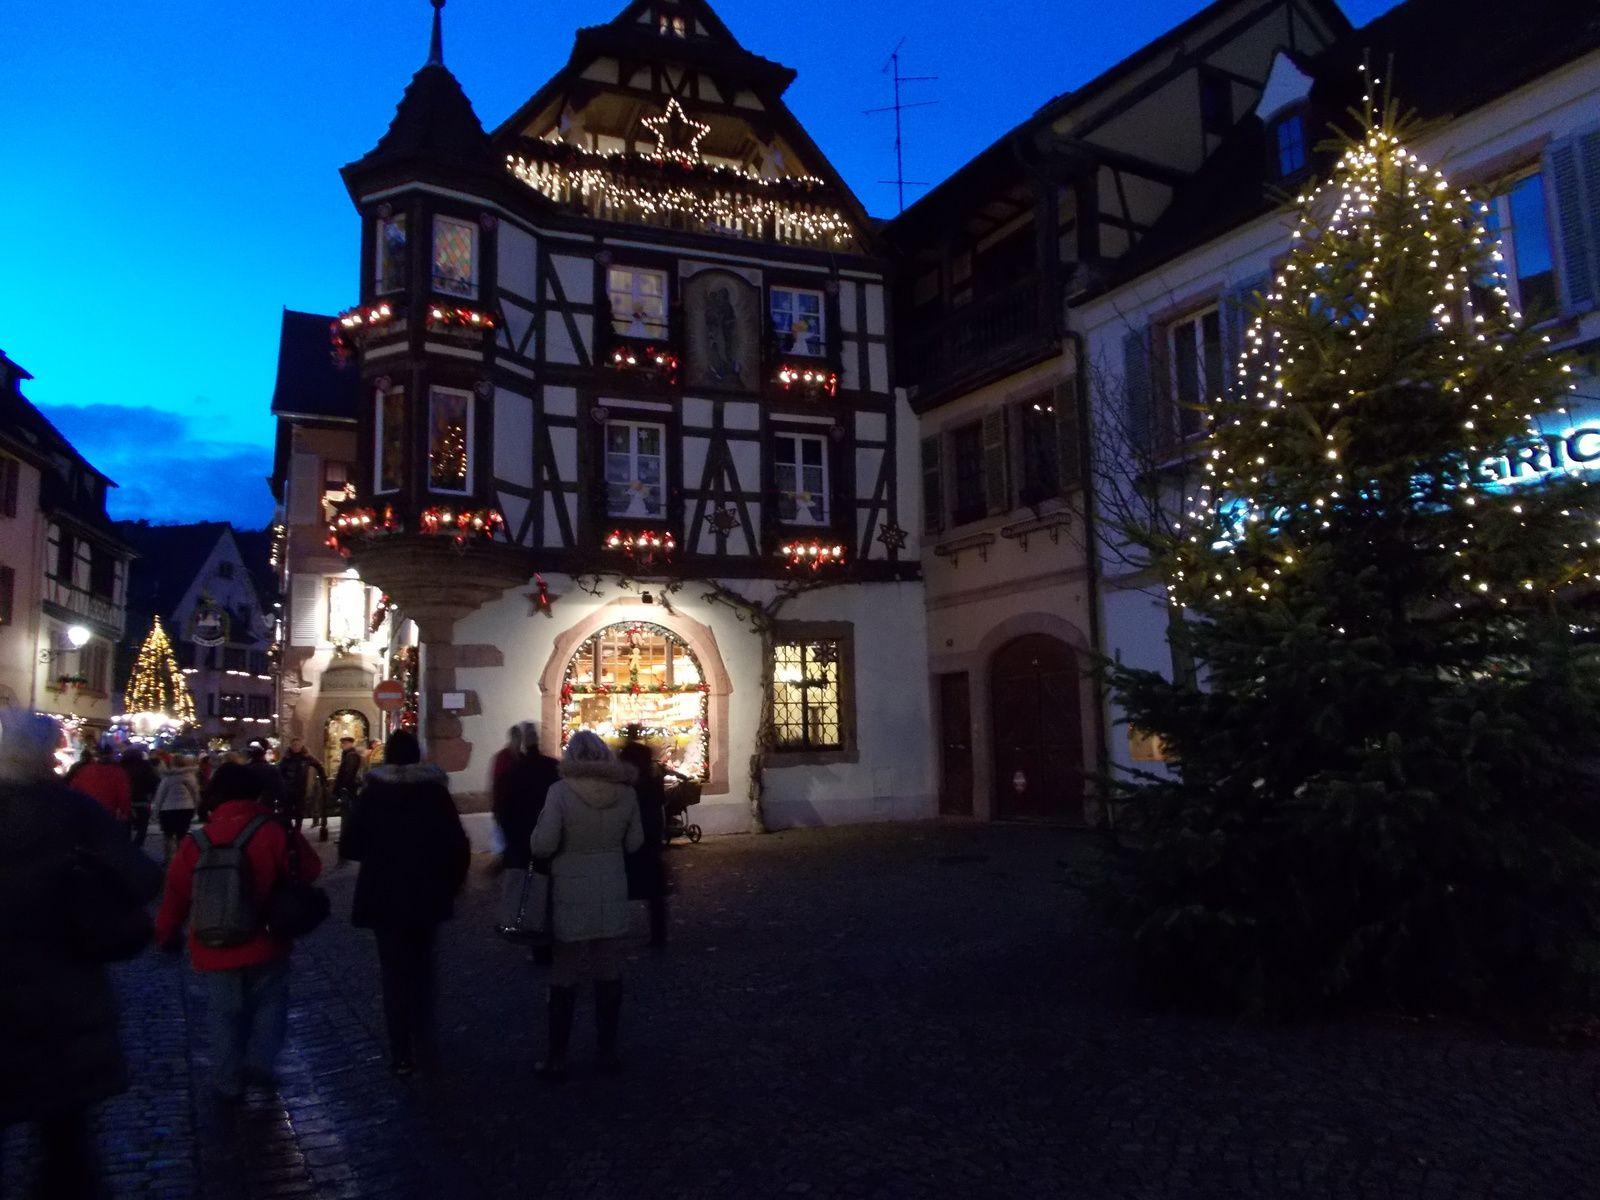 Marché de Noël de Kaysersberg (Alsace)